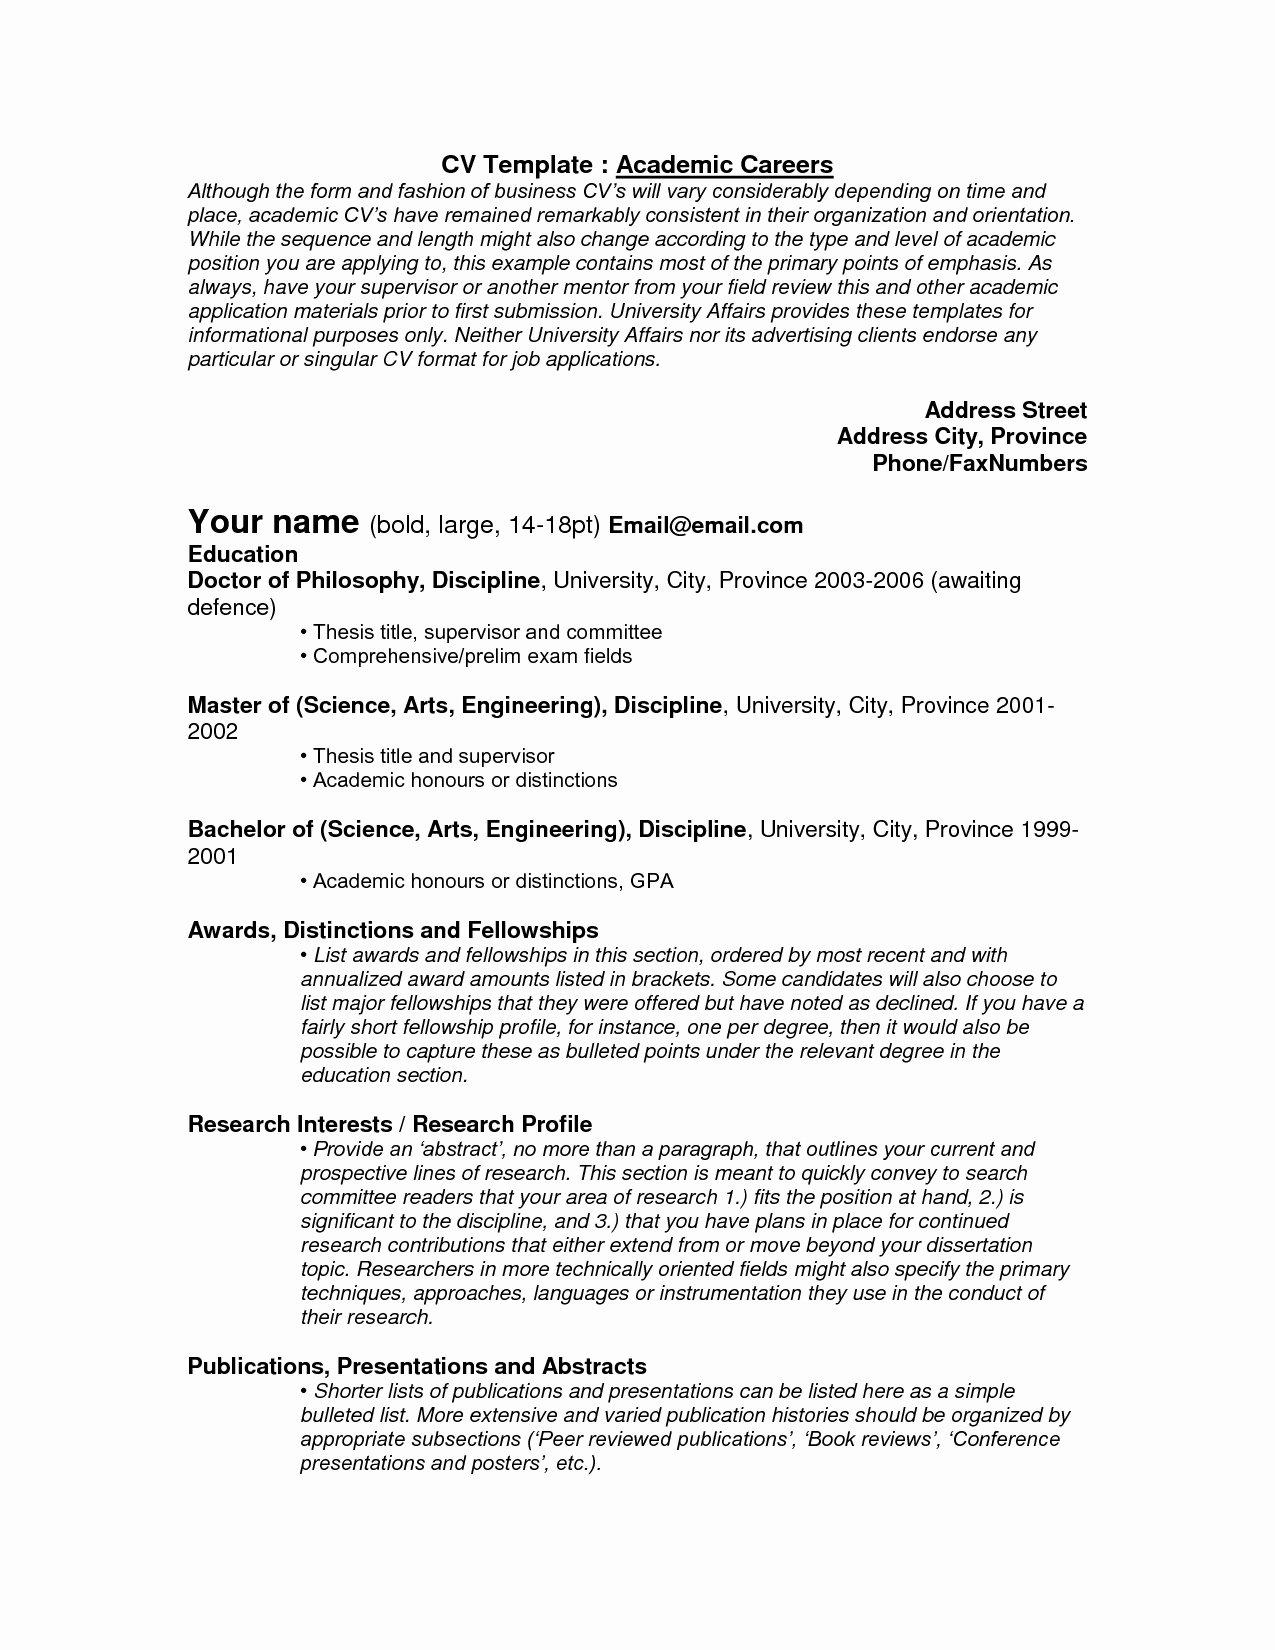 Undergraduate Resume Template Word New Academic Resume Template Word Portablegasgrillweber